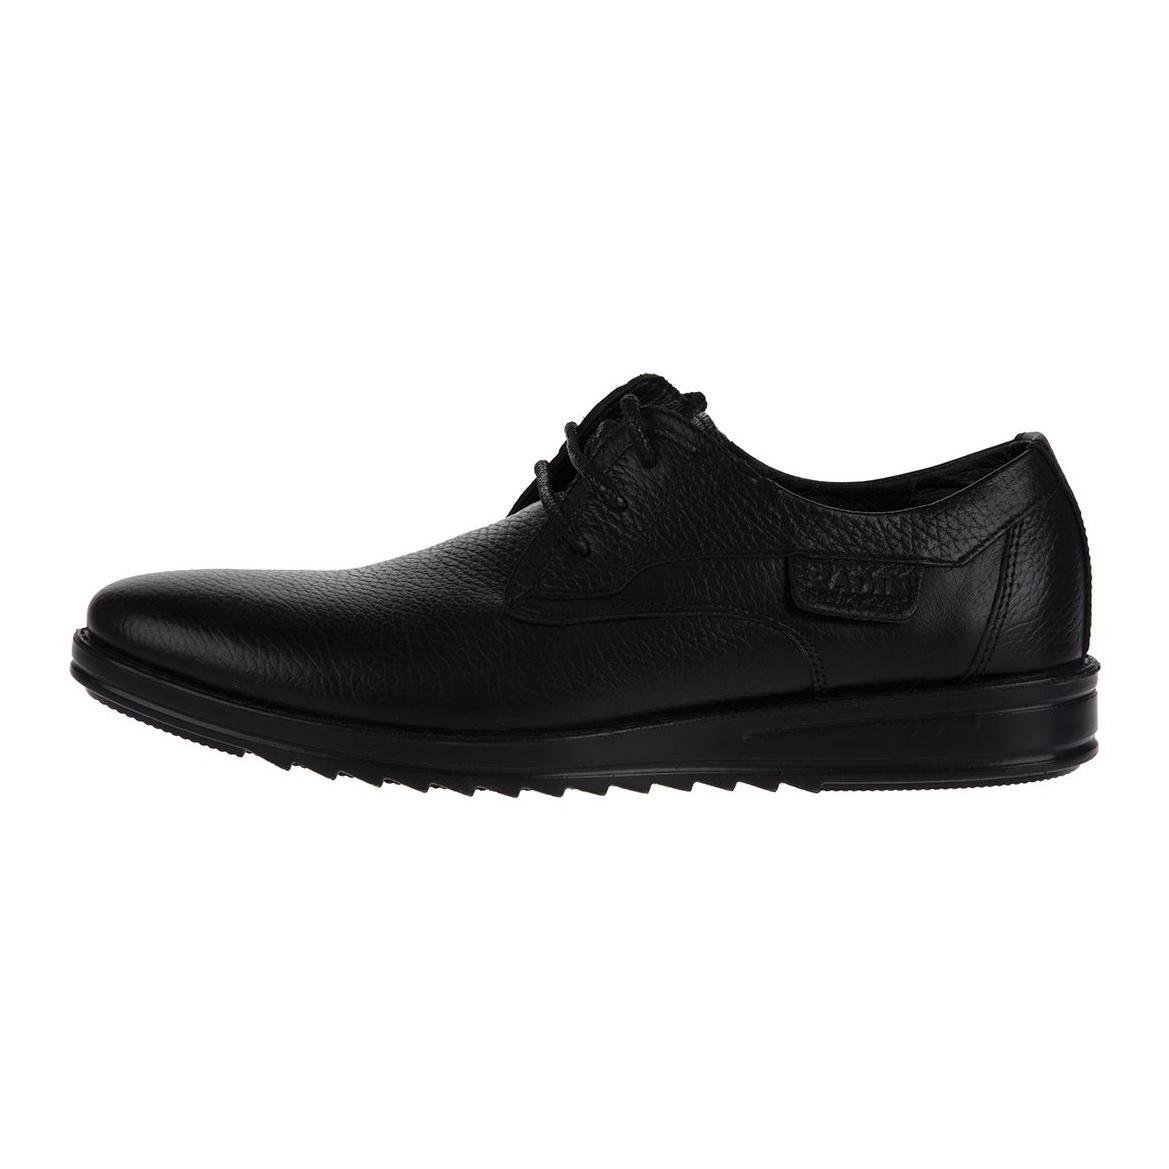 کفش روزمره مردانه رادین کد 1986-2